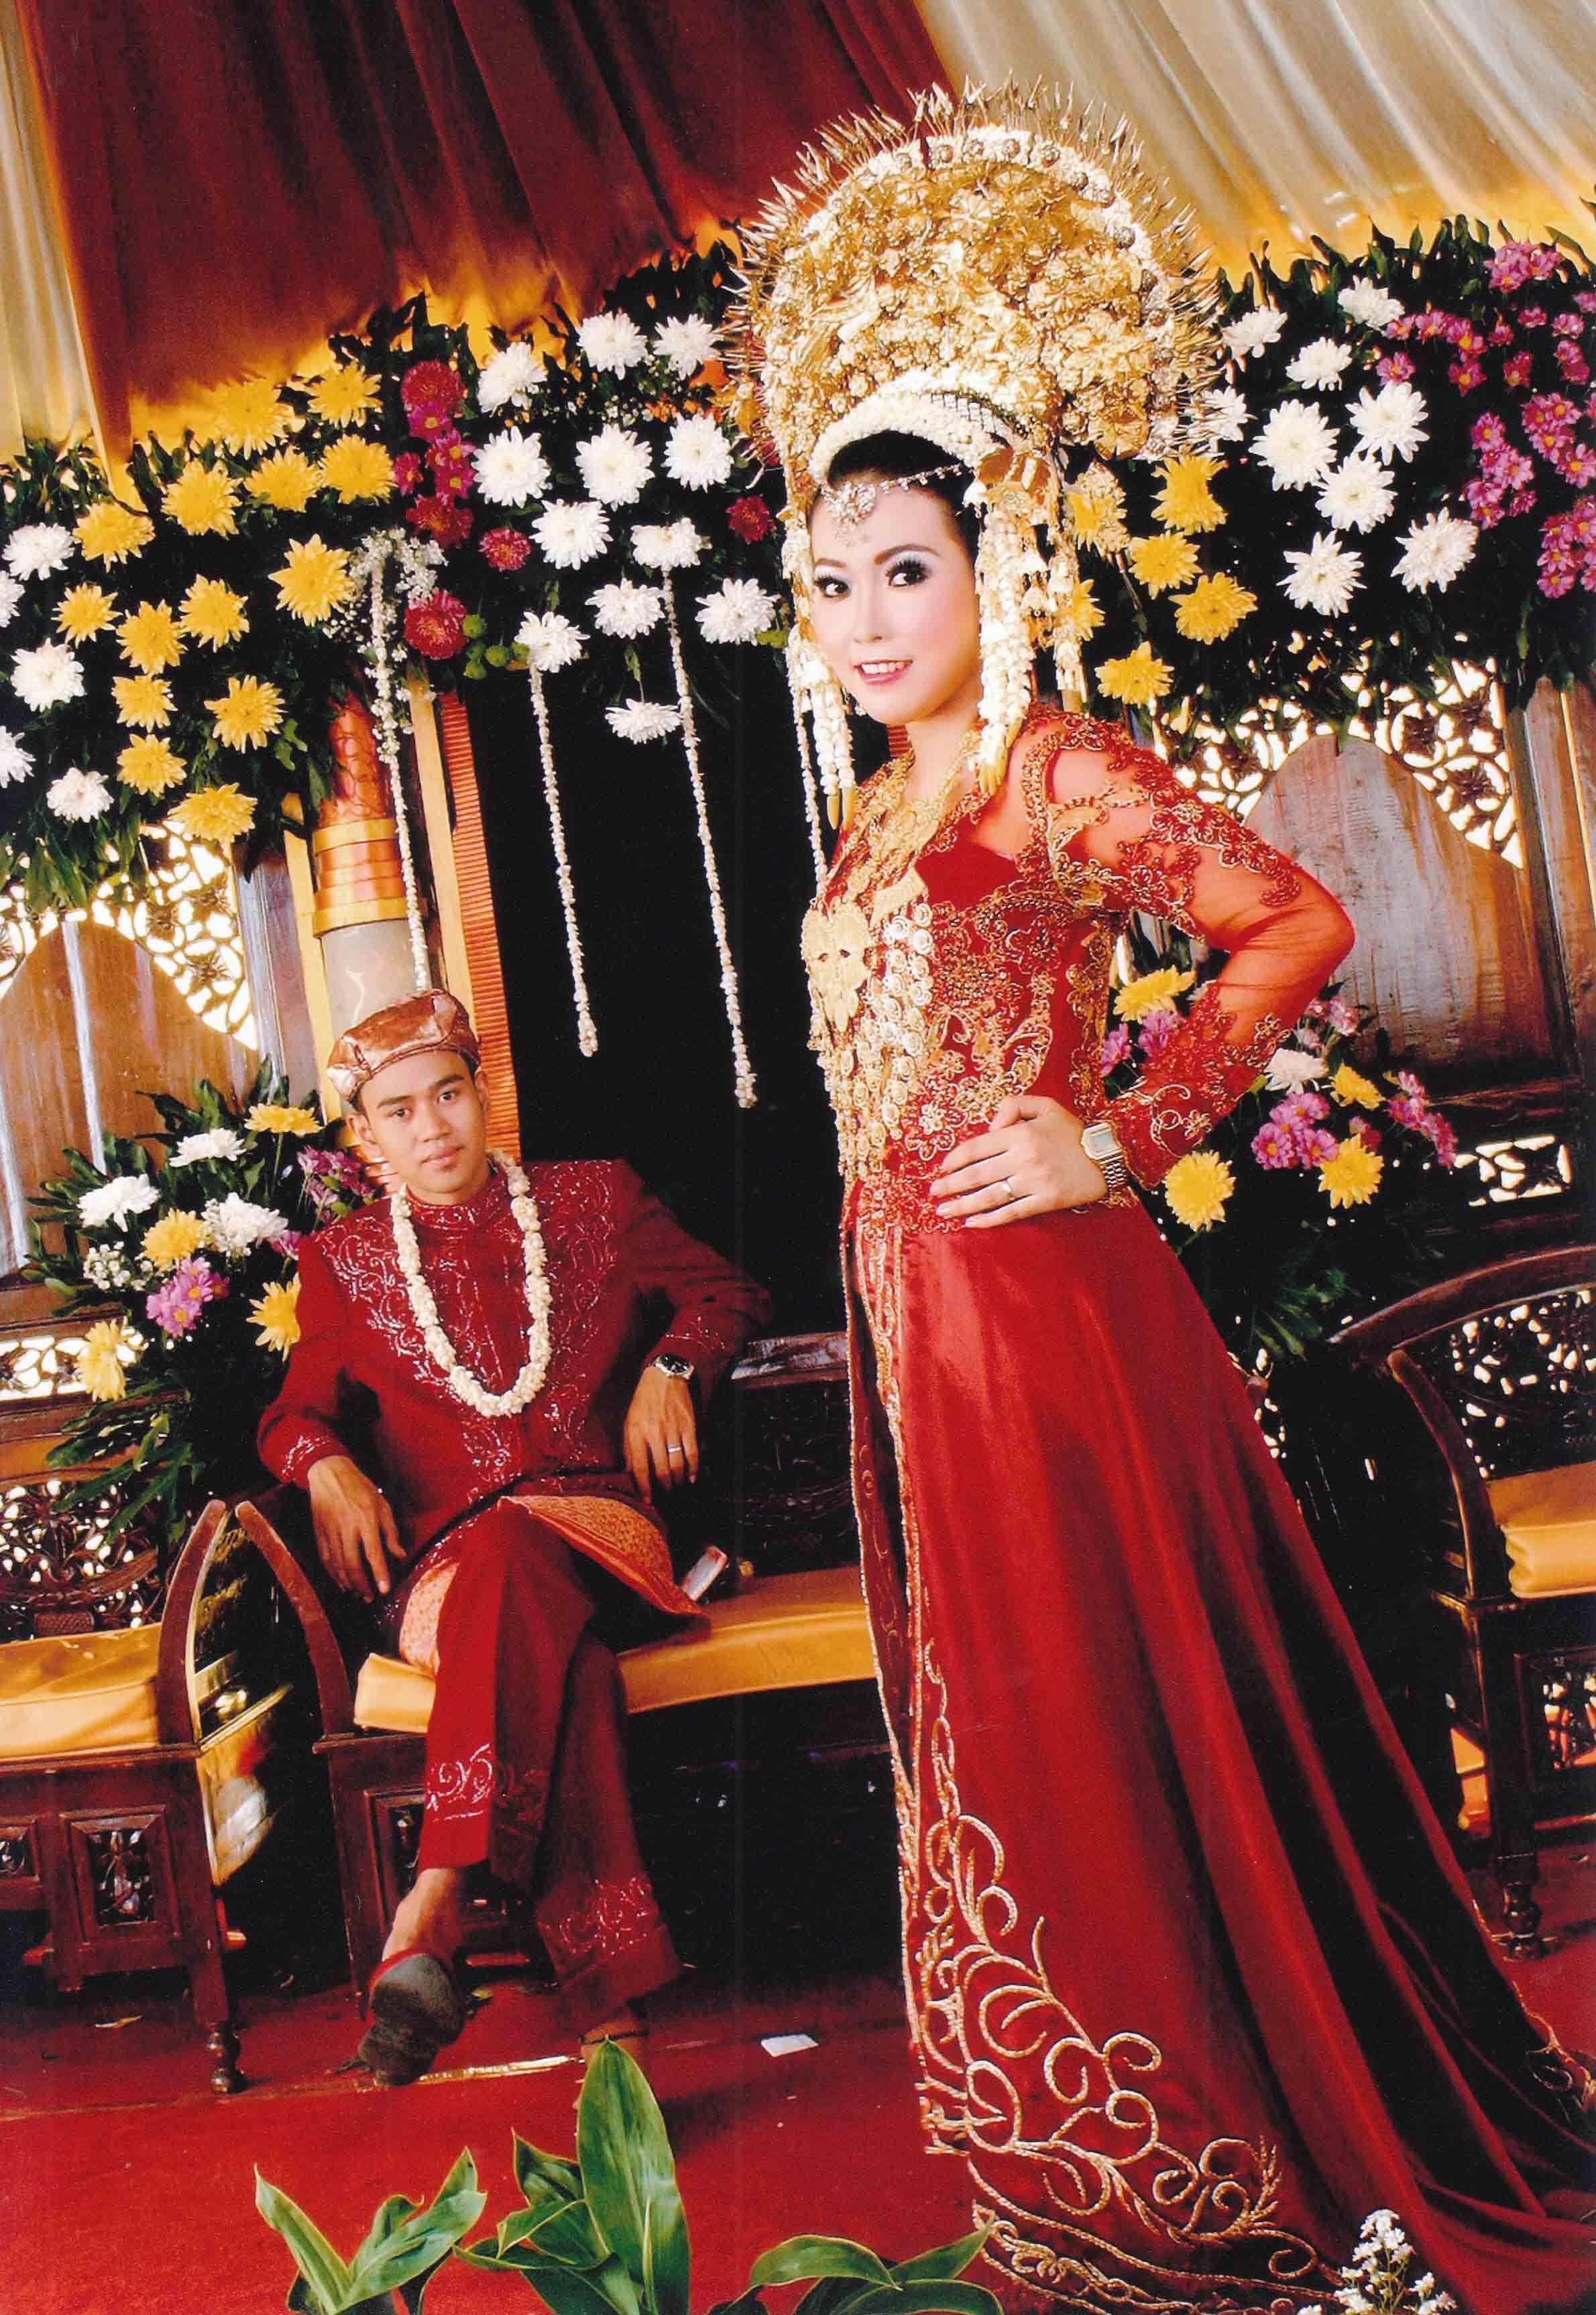 gaun pengantin adat padang  Gaun pengantin, Pengantin, Gaun